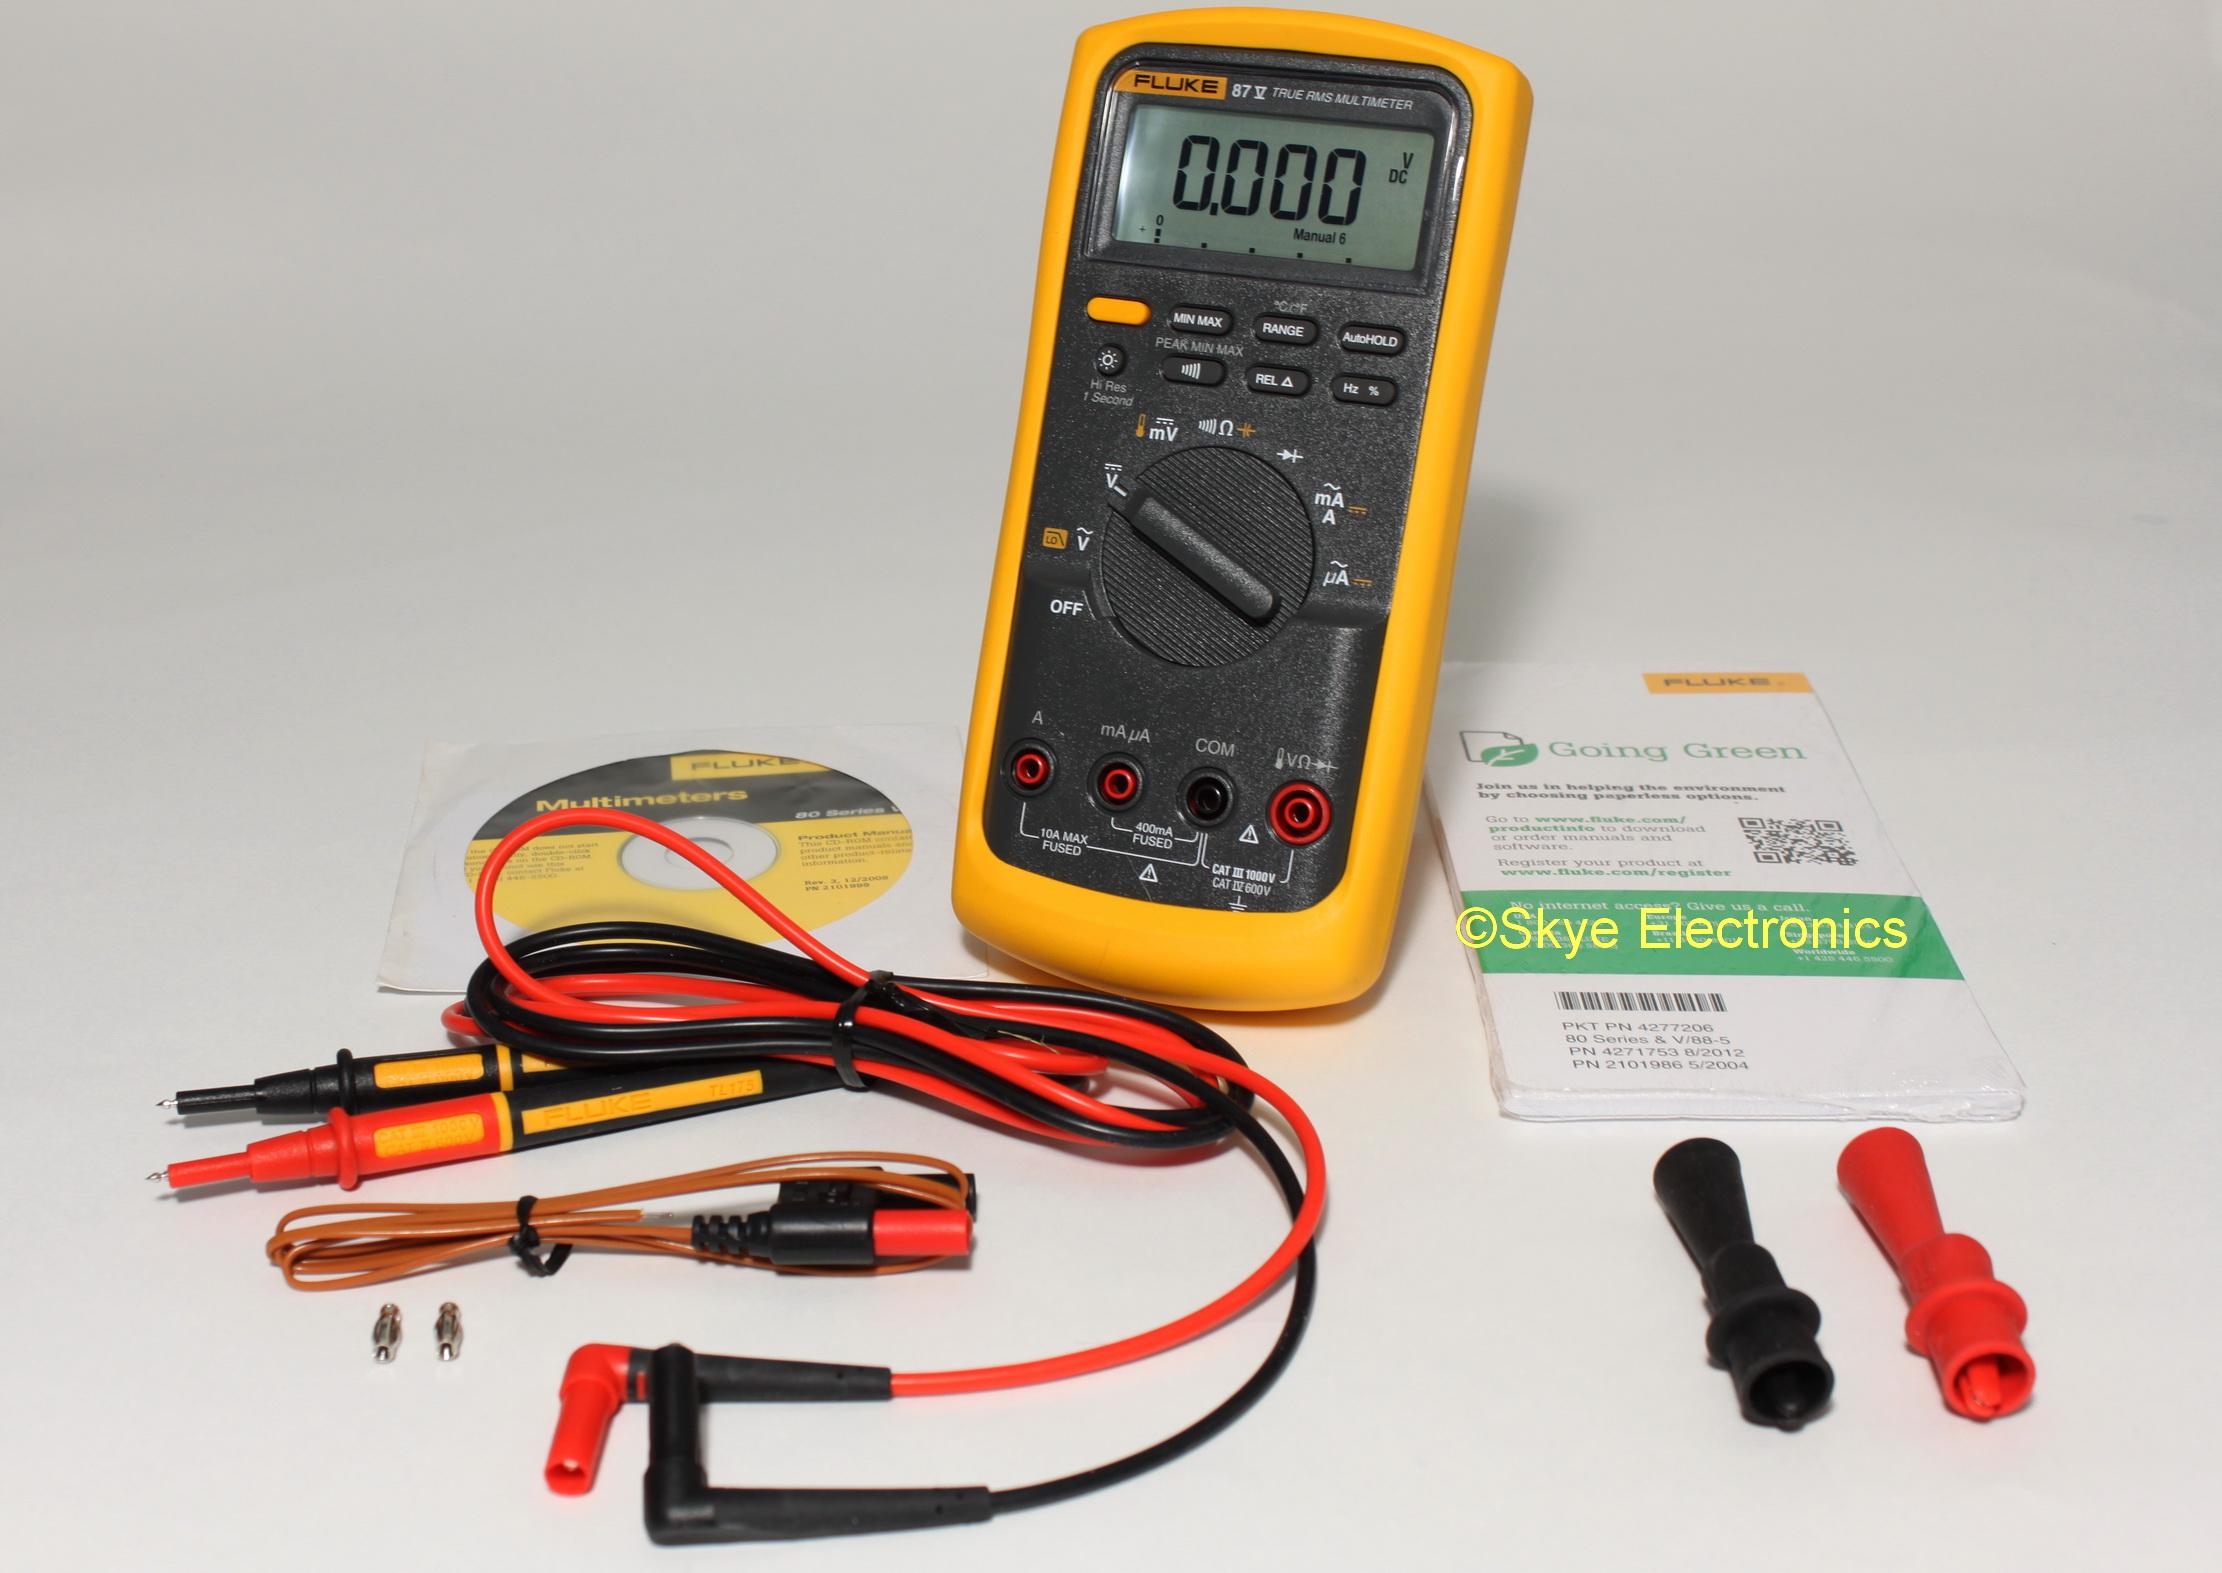 Fluke 87V Skye Electronics